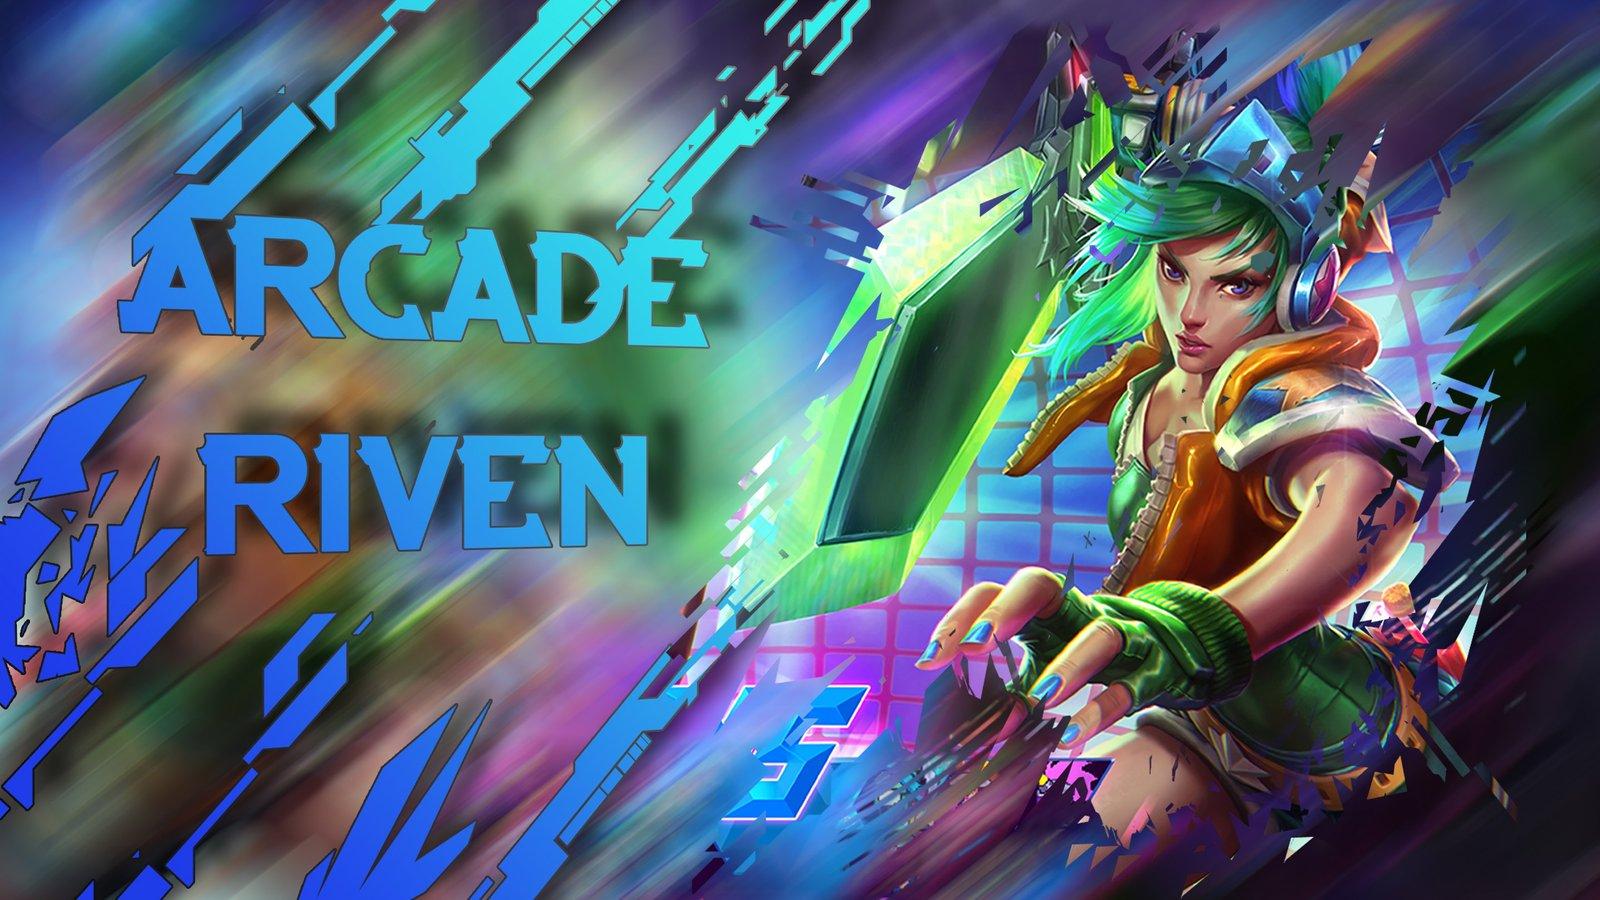 Arcade Riven Wallpapers Fan Arts League Of Legends Lol Stats